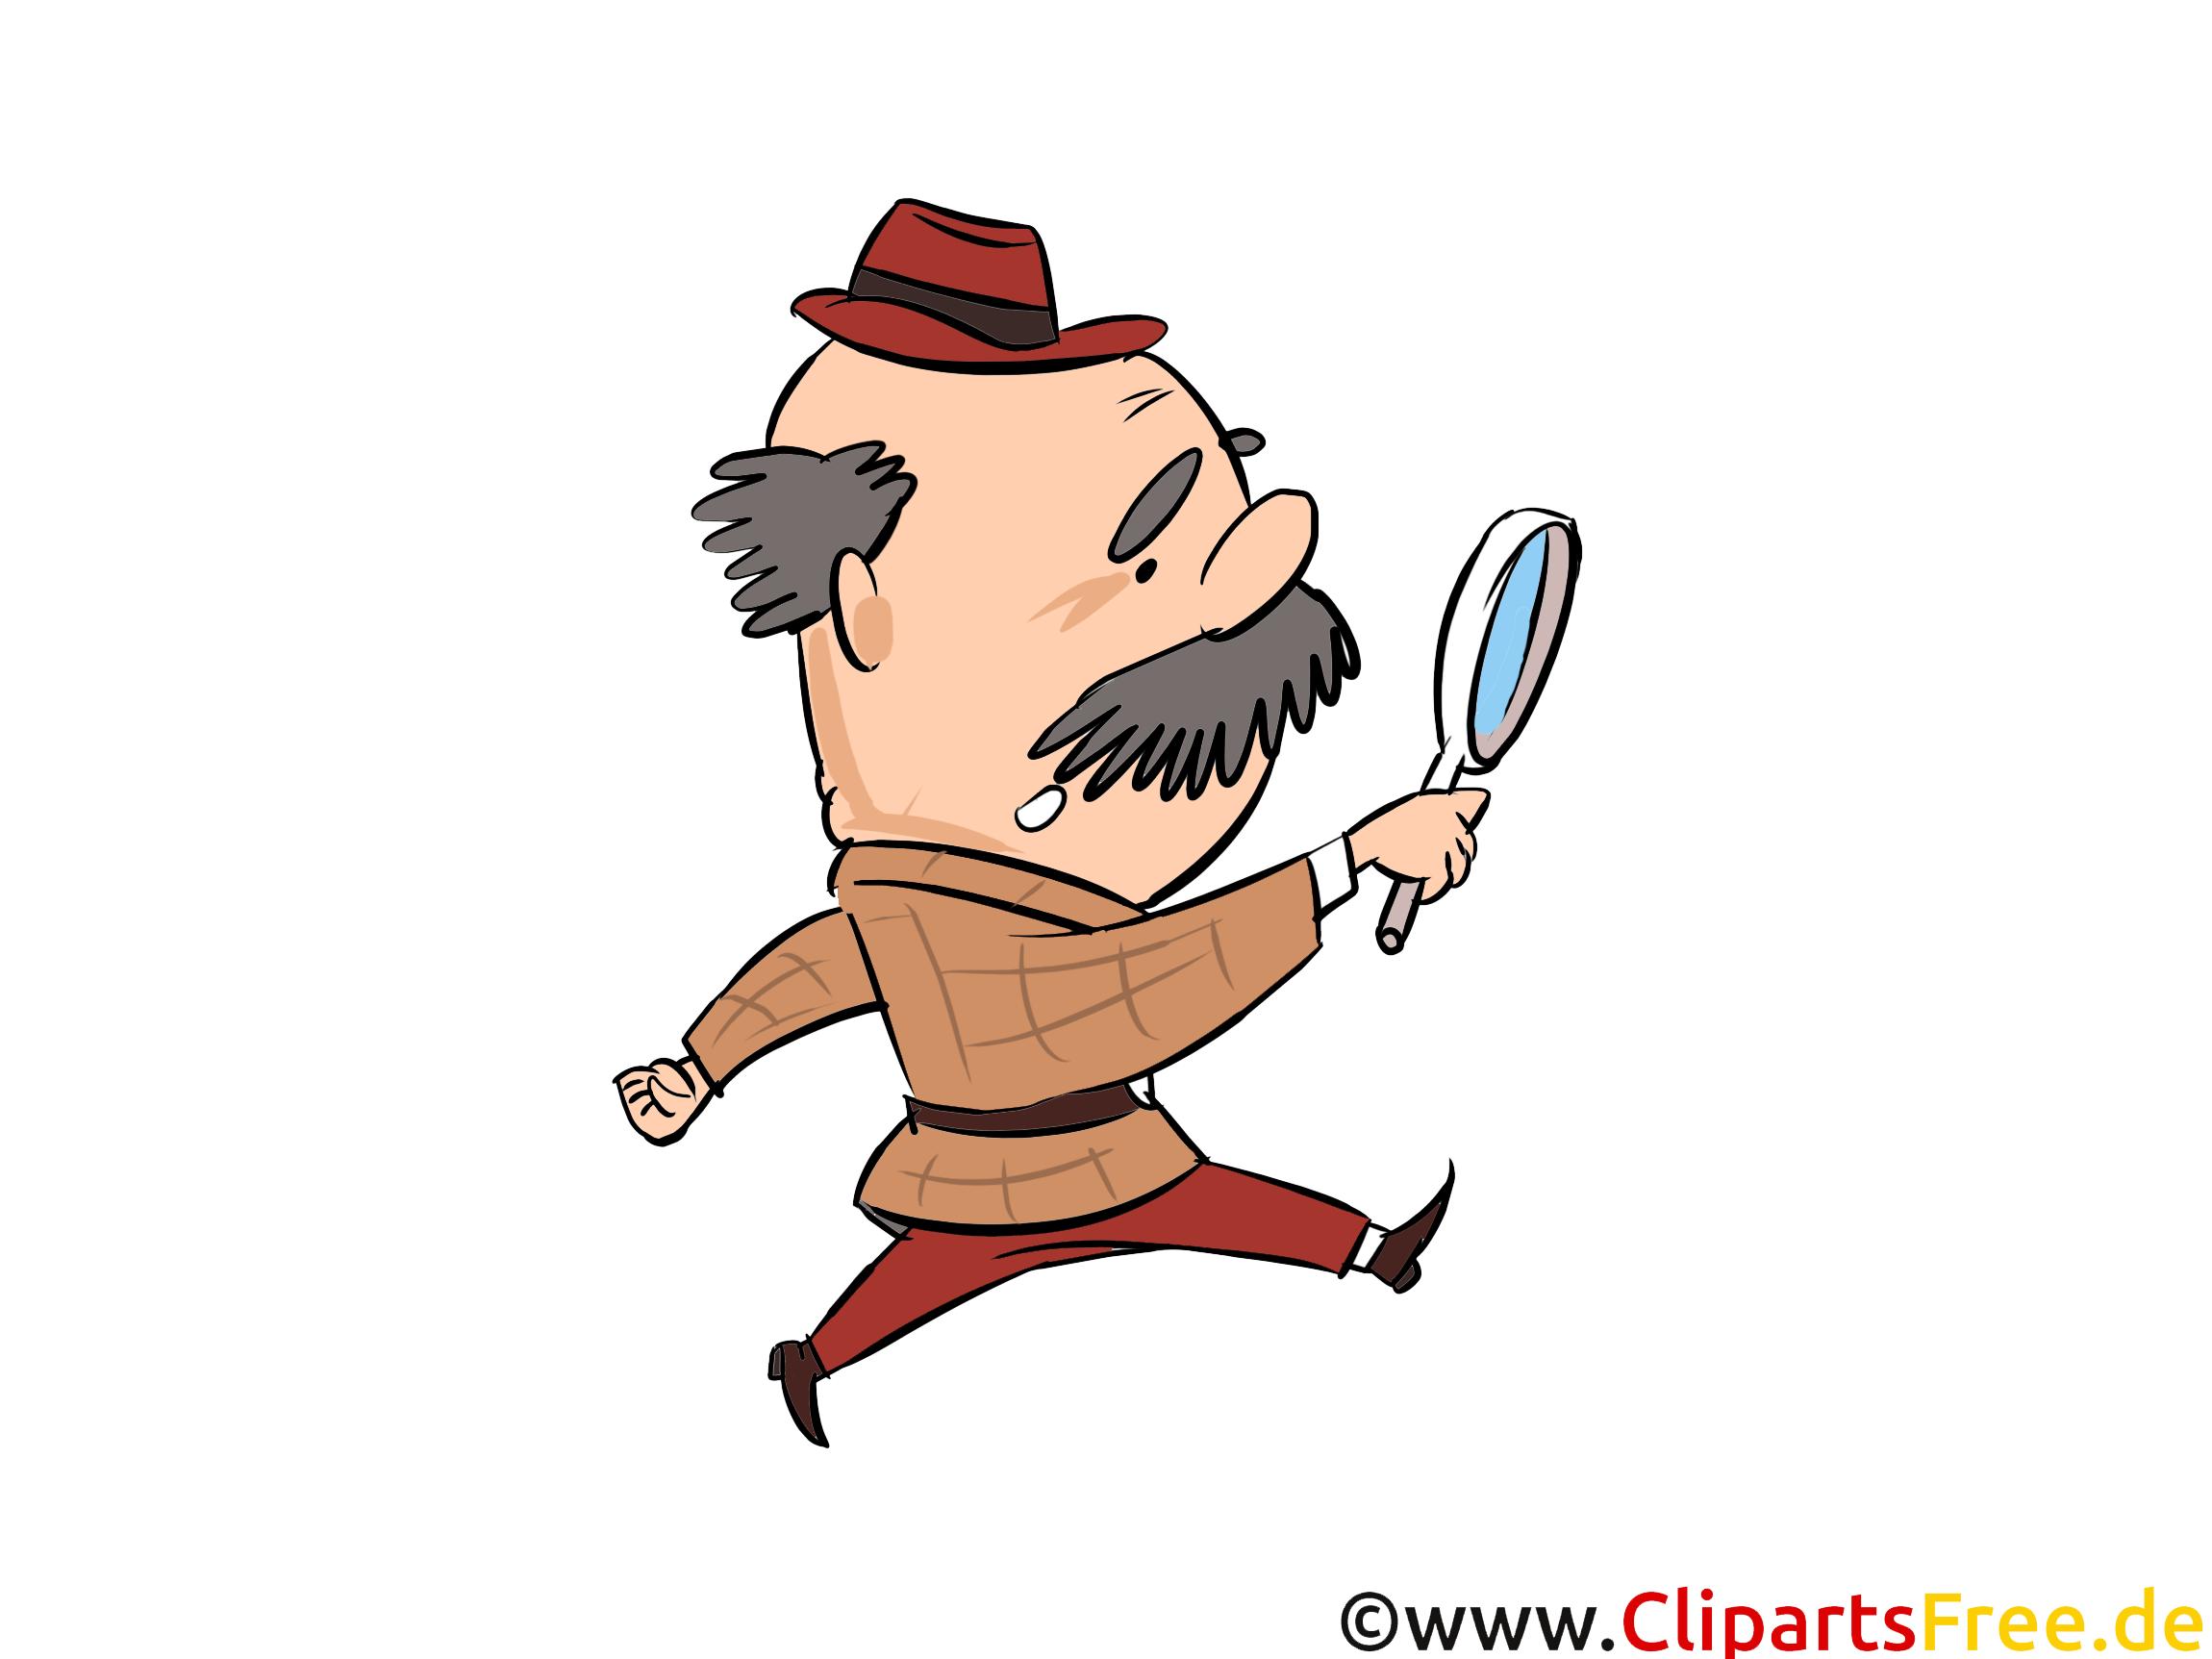 Opa, Großvater Clipart, Illustration, Comic, Cartoon, Bild